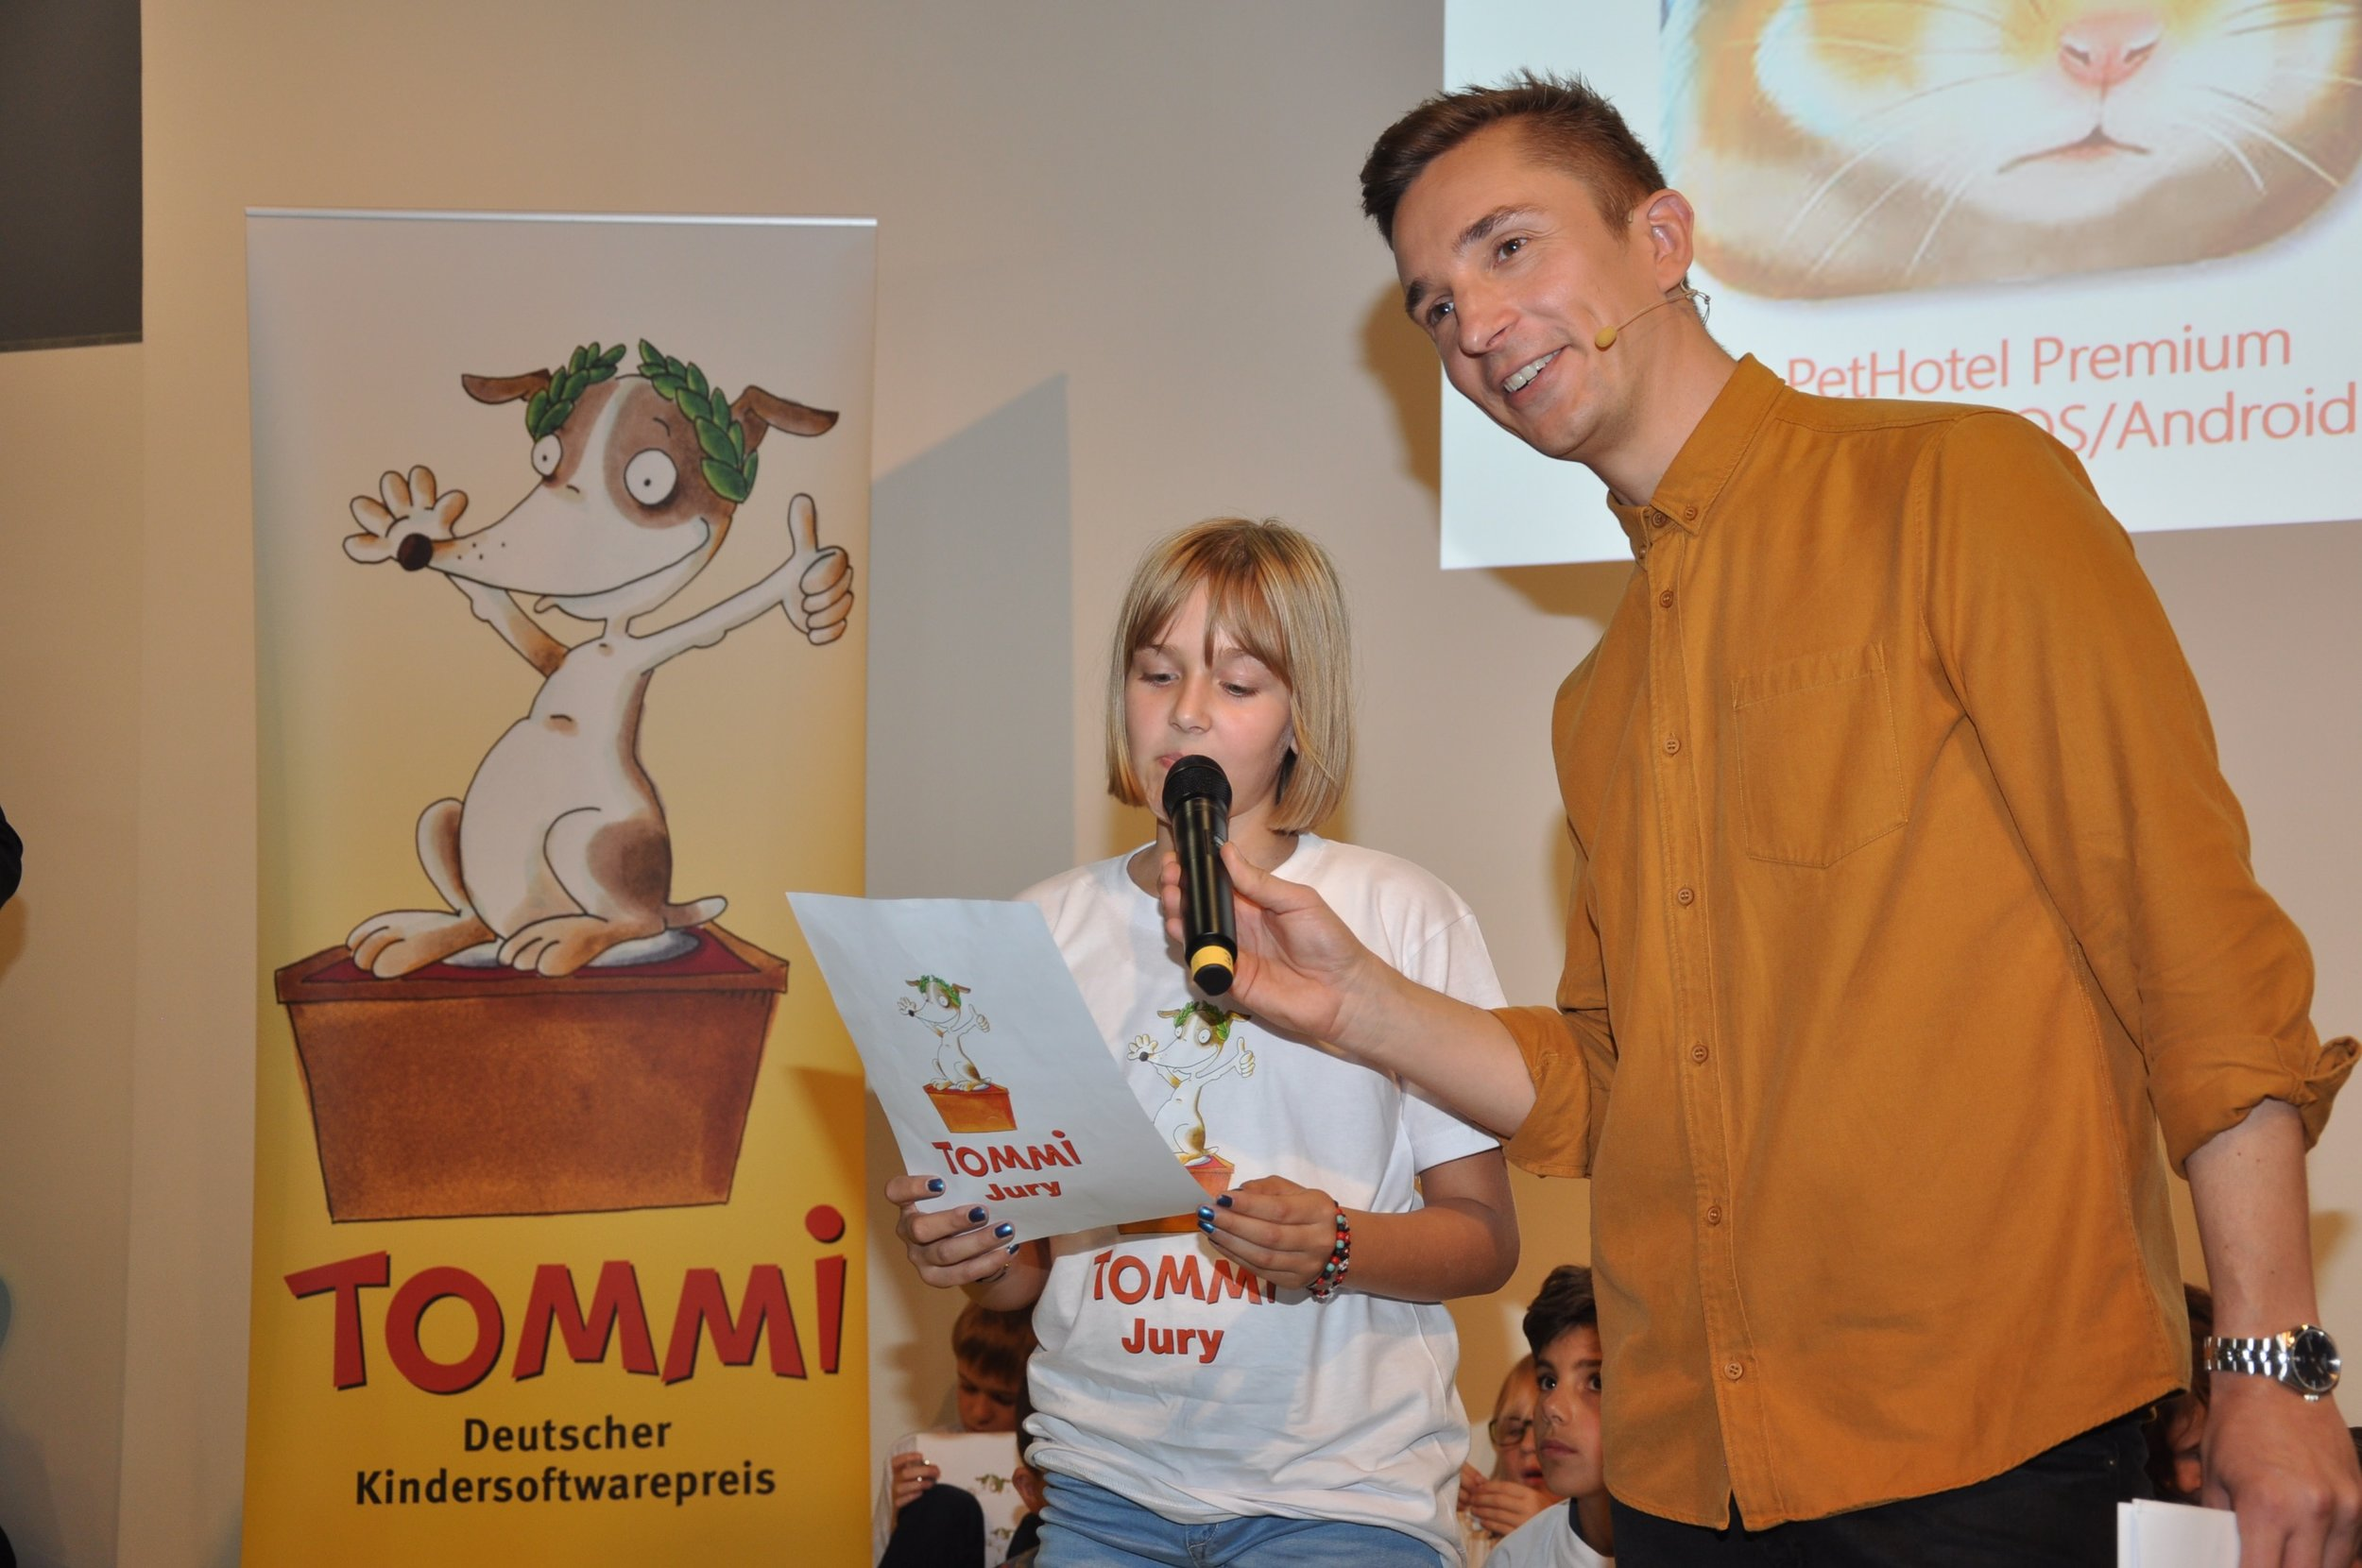 Deutscher Kindersoftwarepreis TOMMI